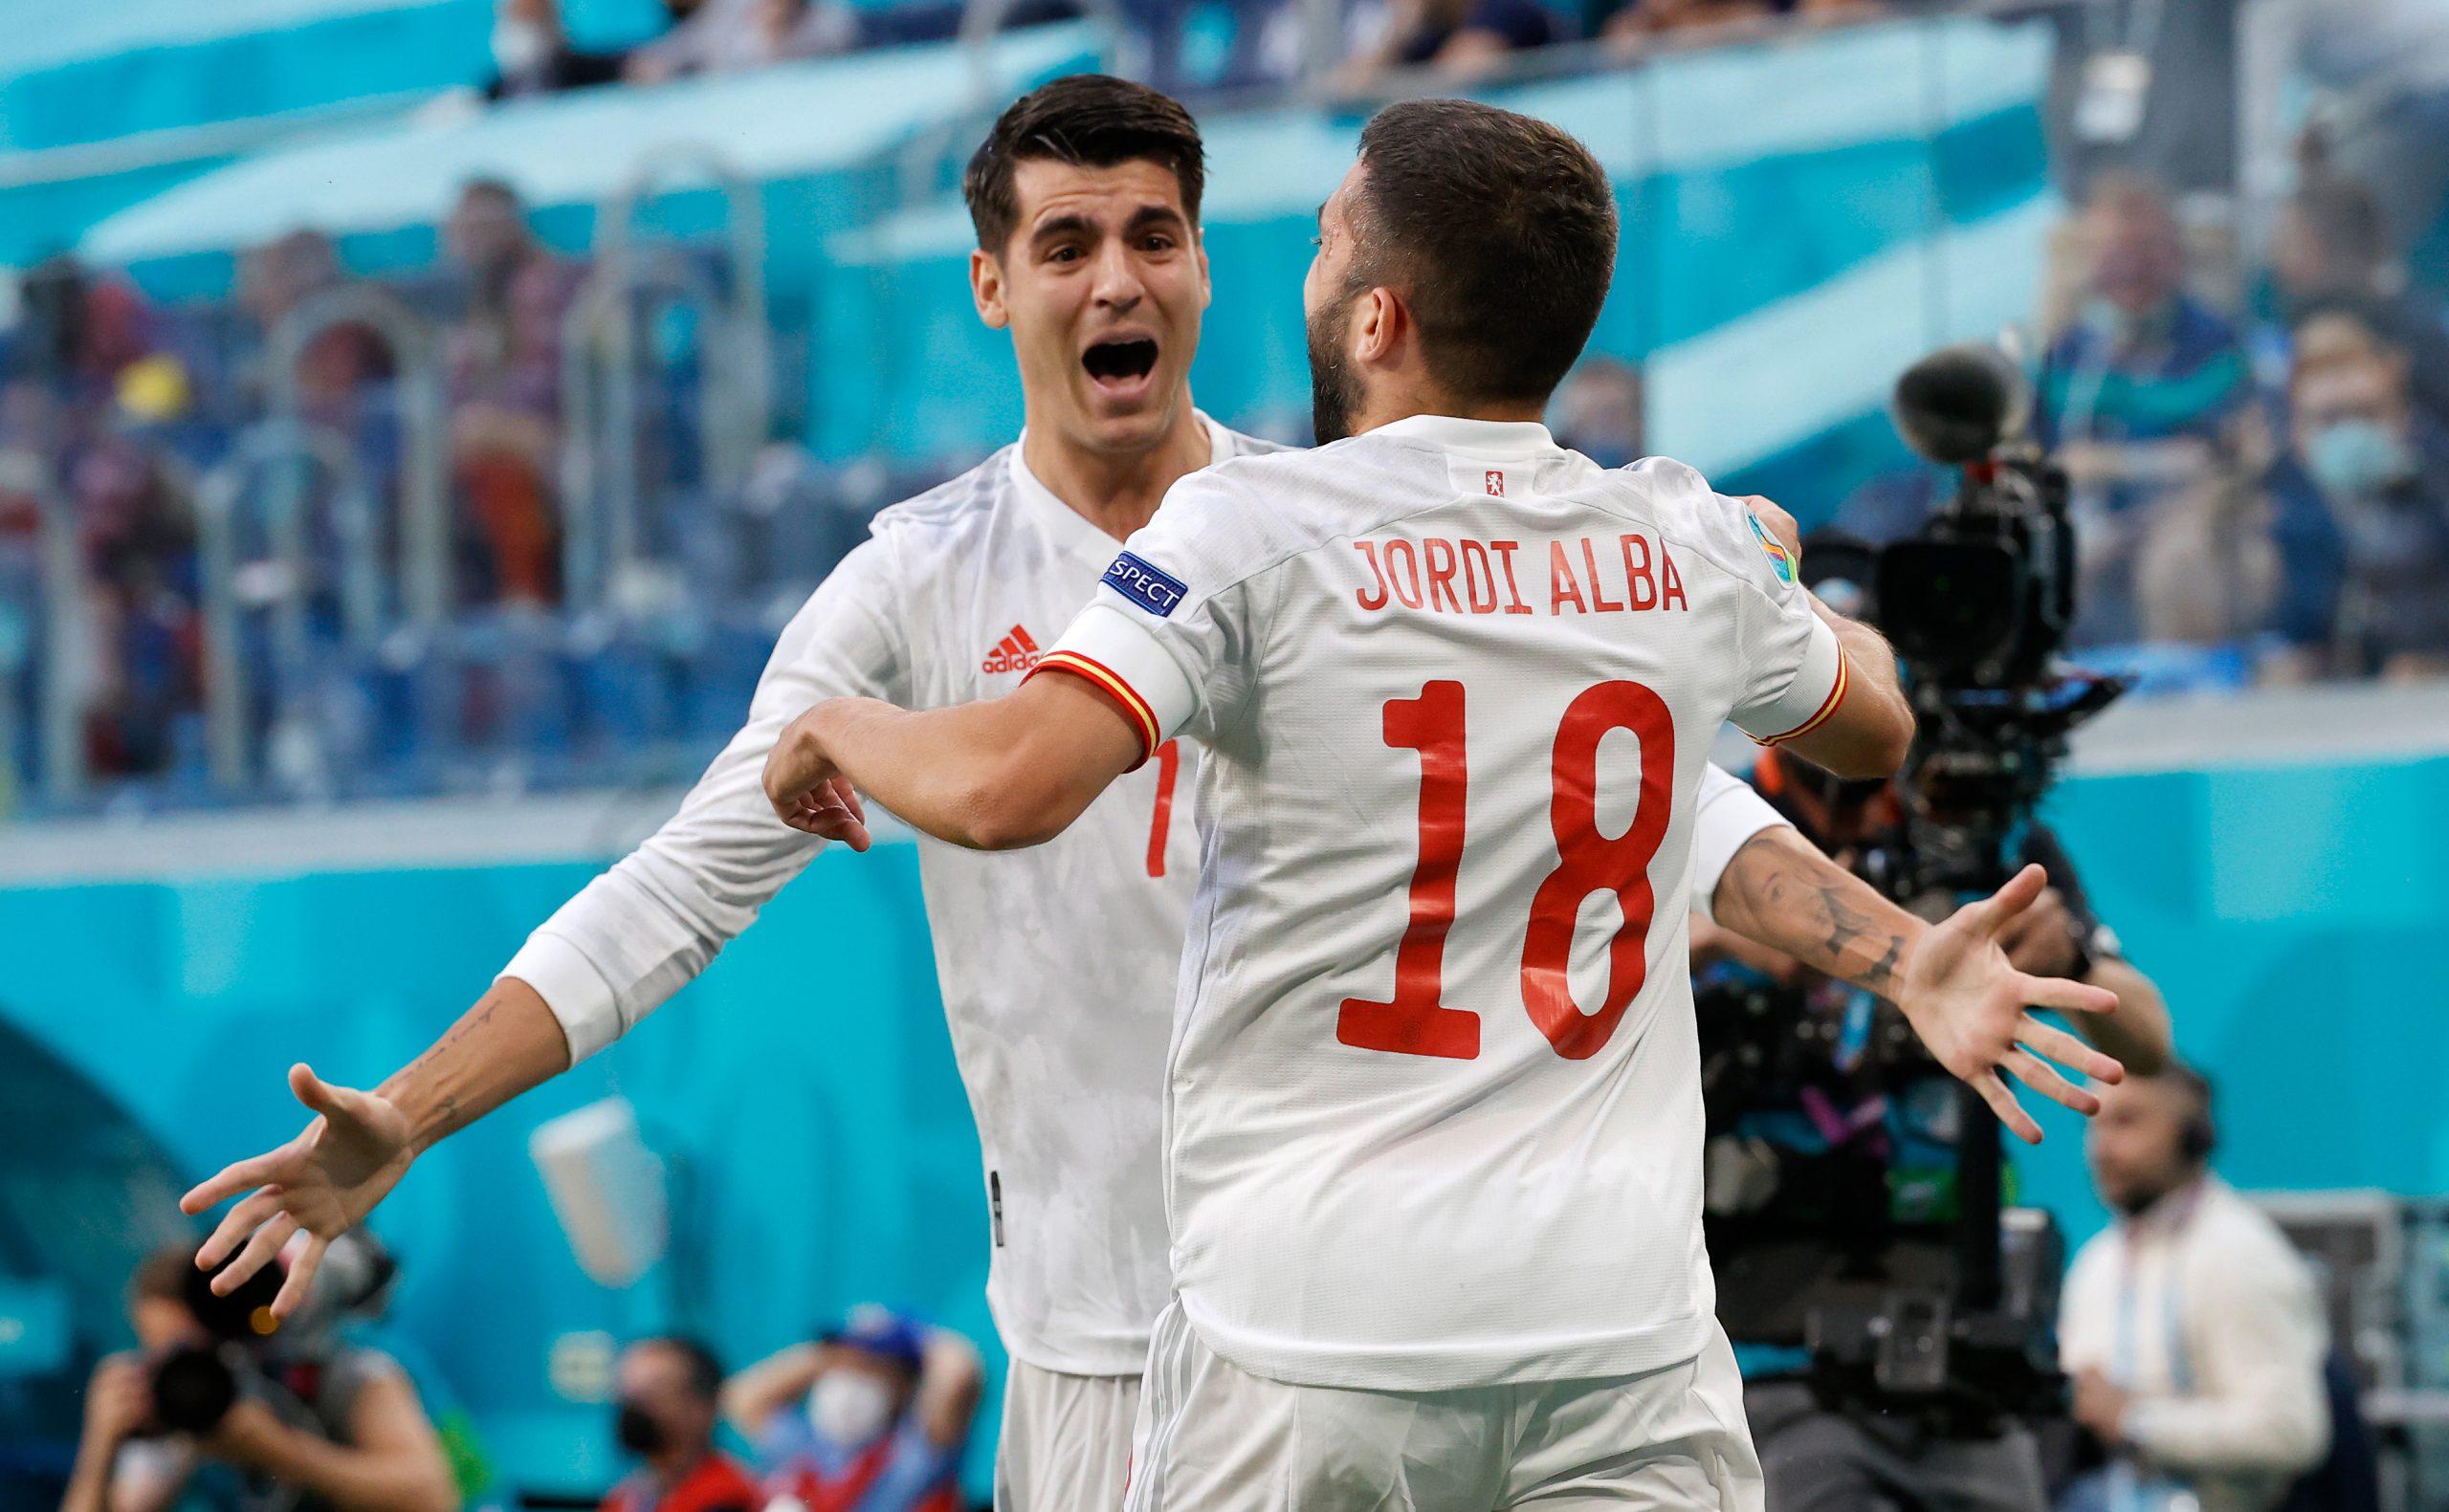 Euro 2020: Spain Beat Switzerland on Penalties to Reach Semi-Finals